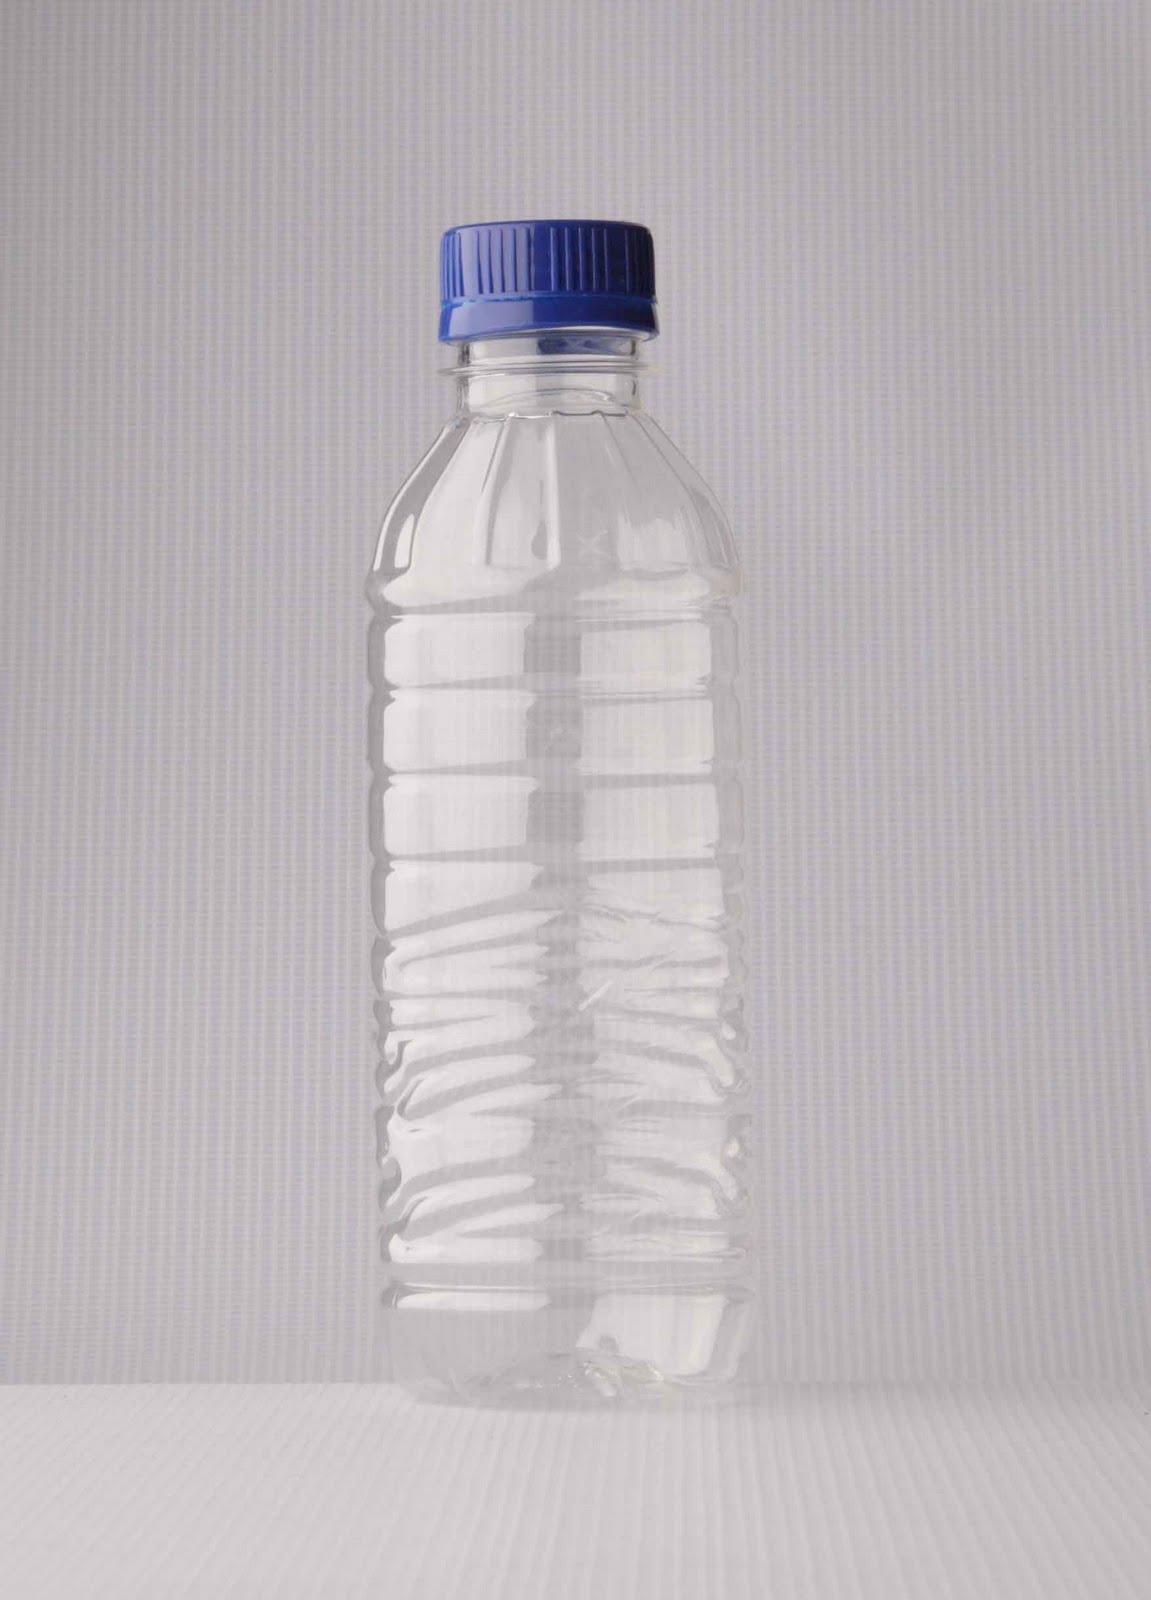 aqua botol 750 ml related keywords suggestions aqua